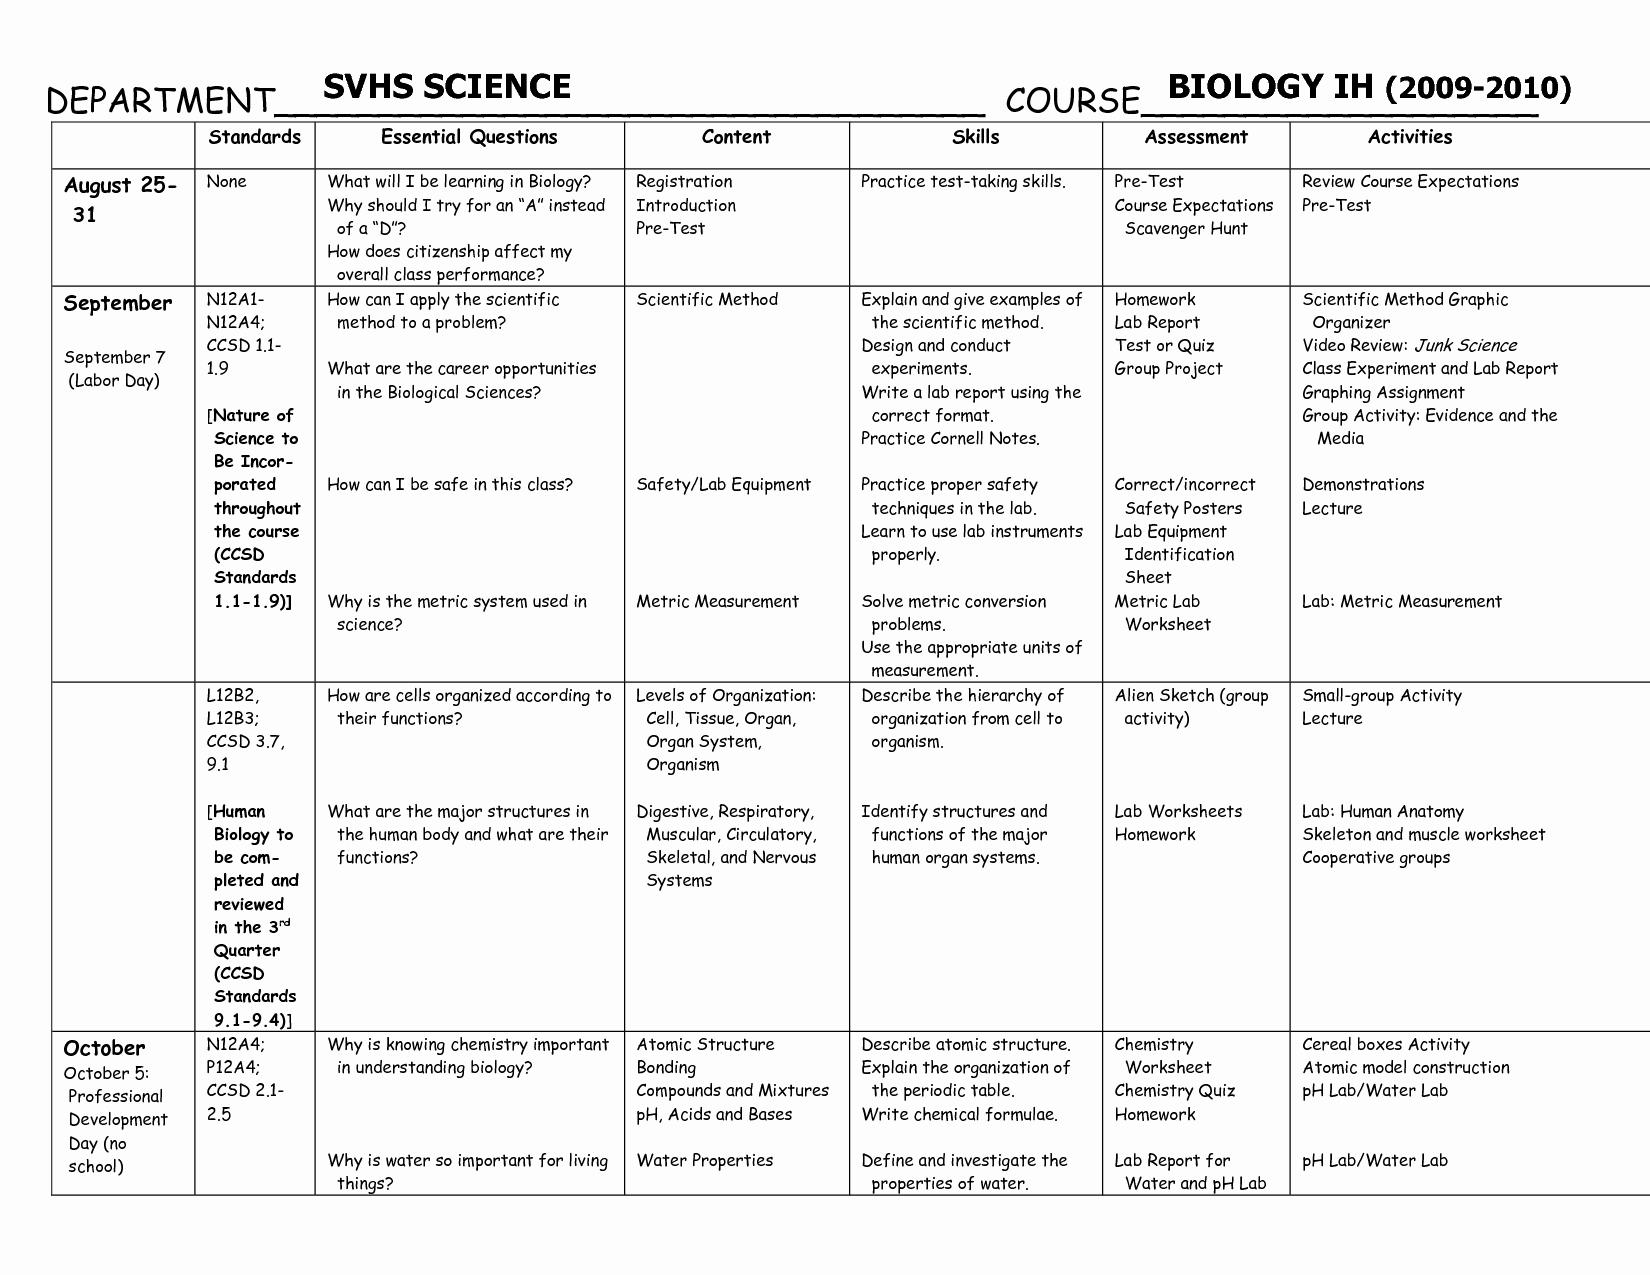 50 Function Of The Organelles Worksheet